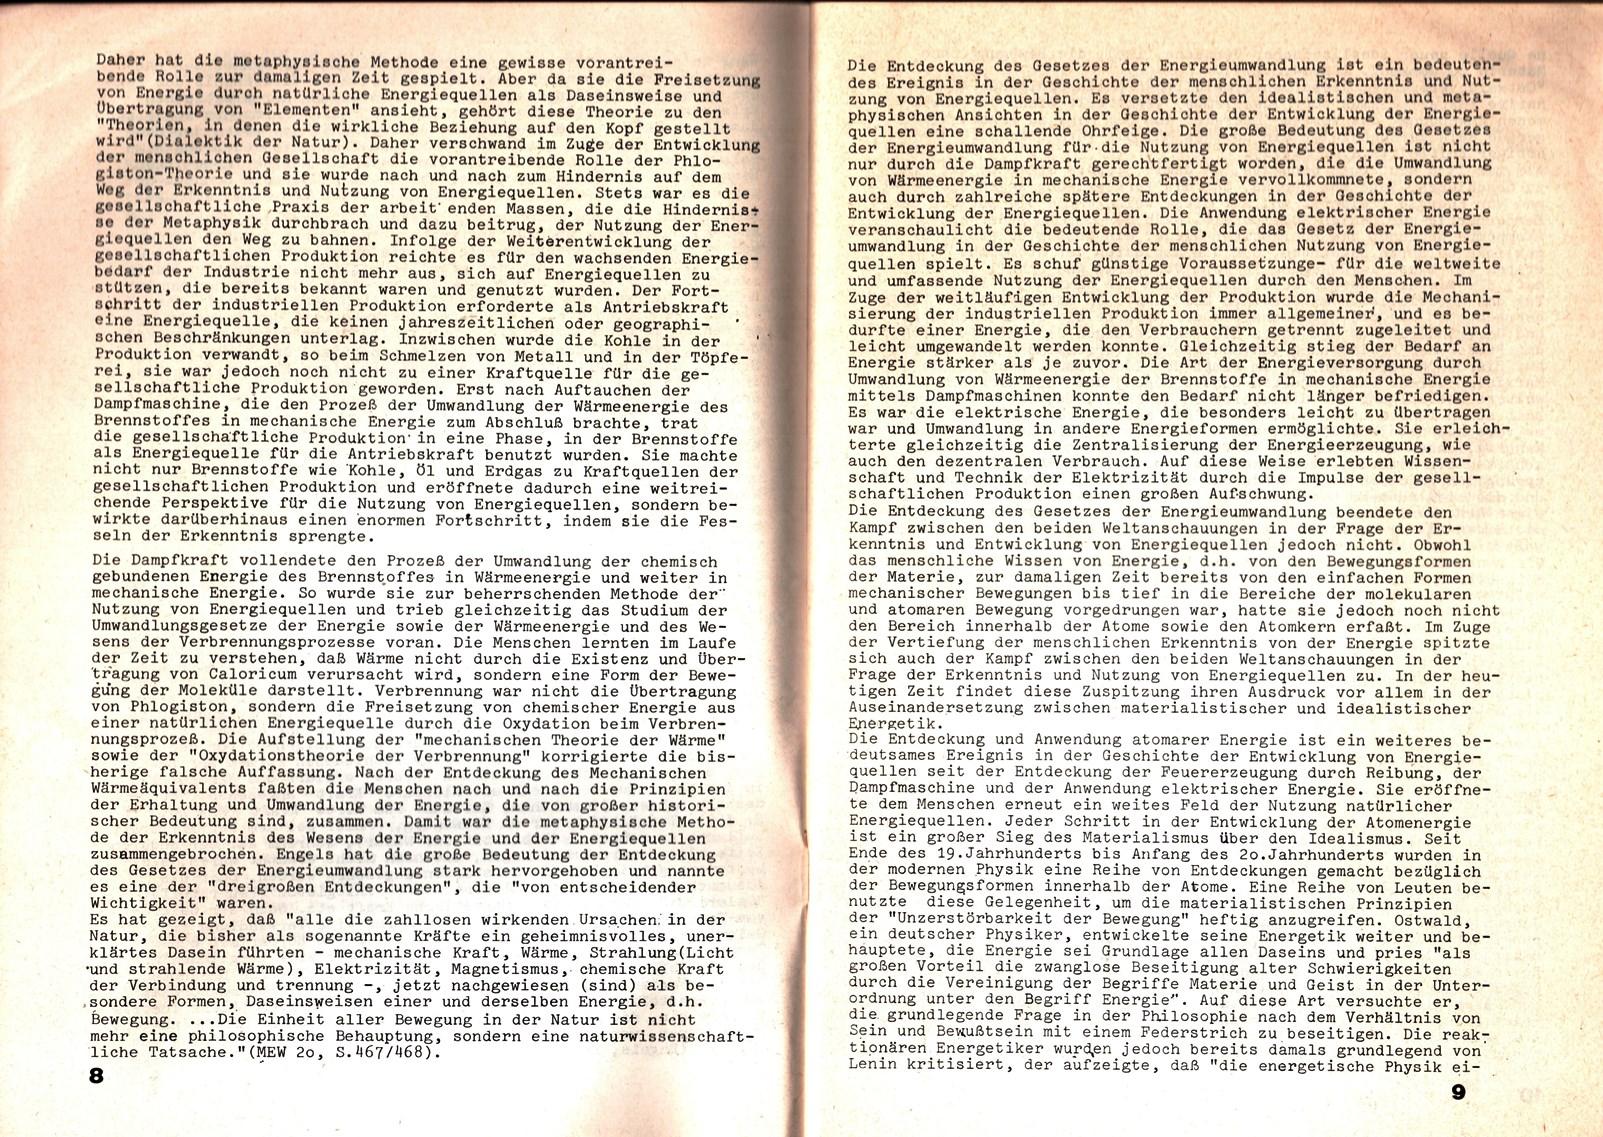 KSV_1976_Atomenergie_im_Kapitalismus_006